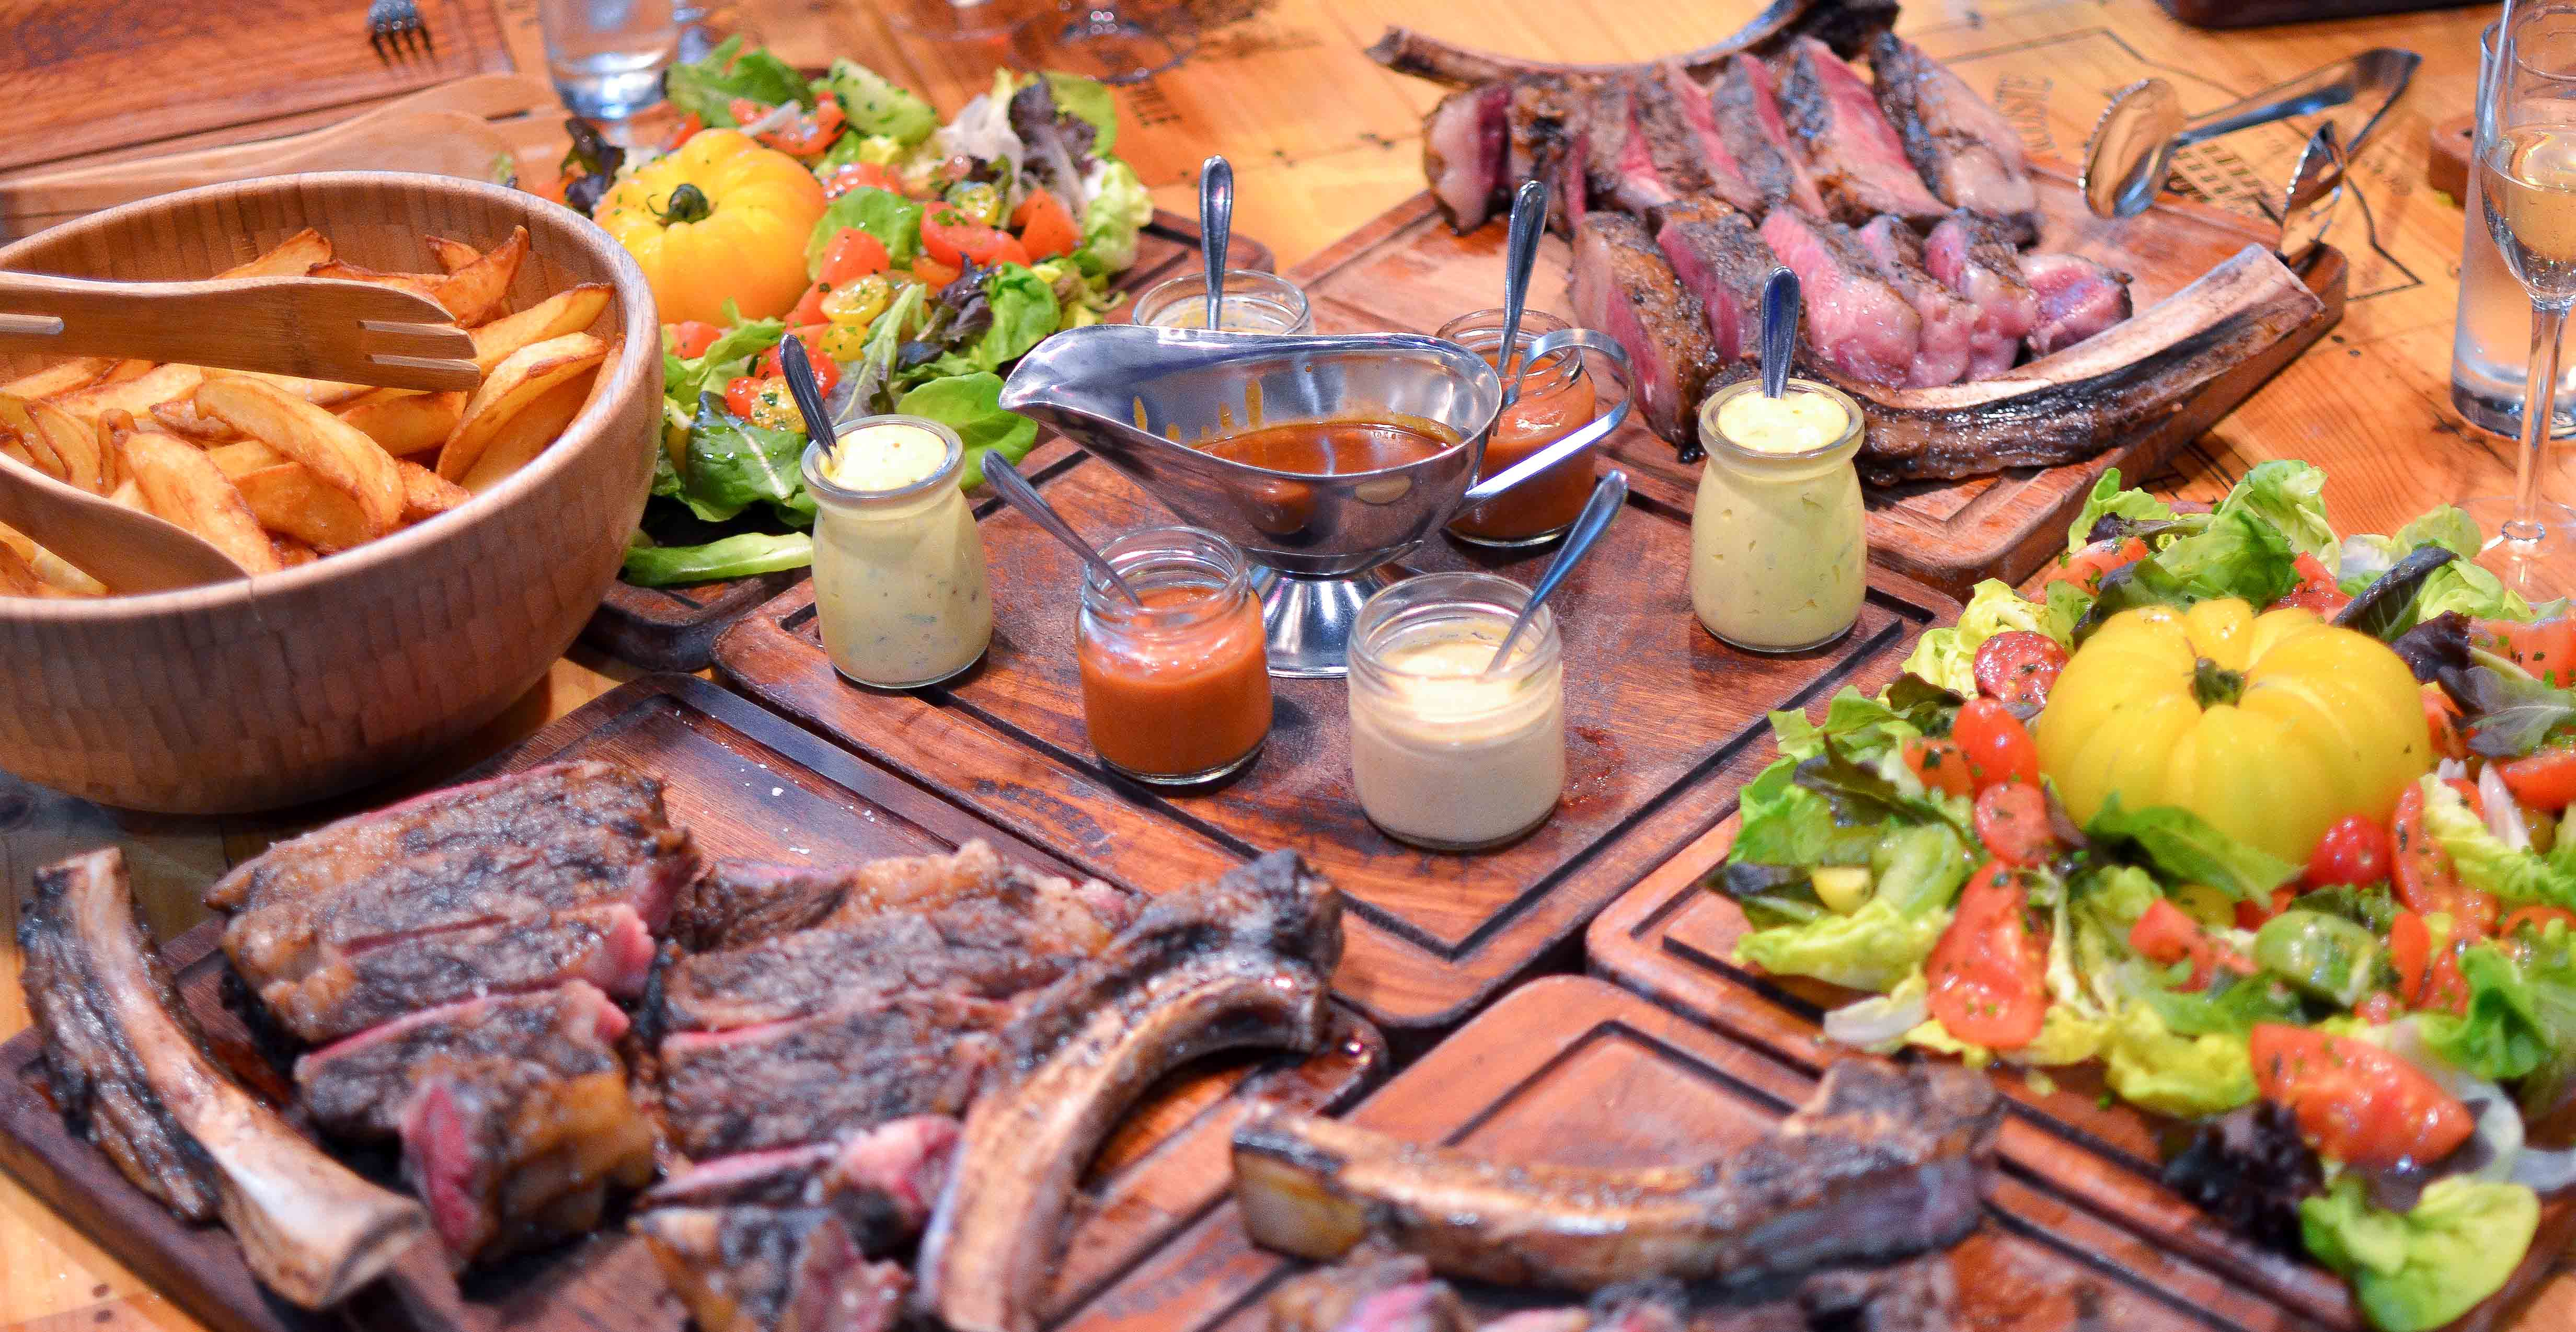 The Big Beef Feast